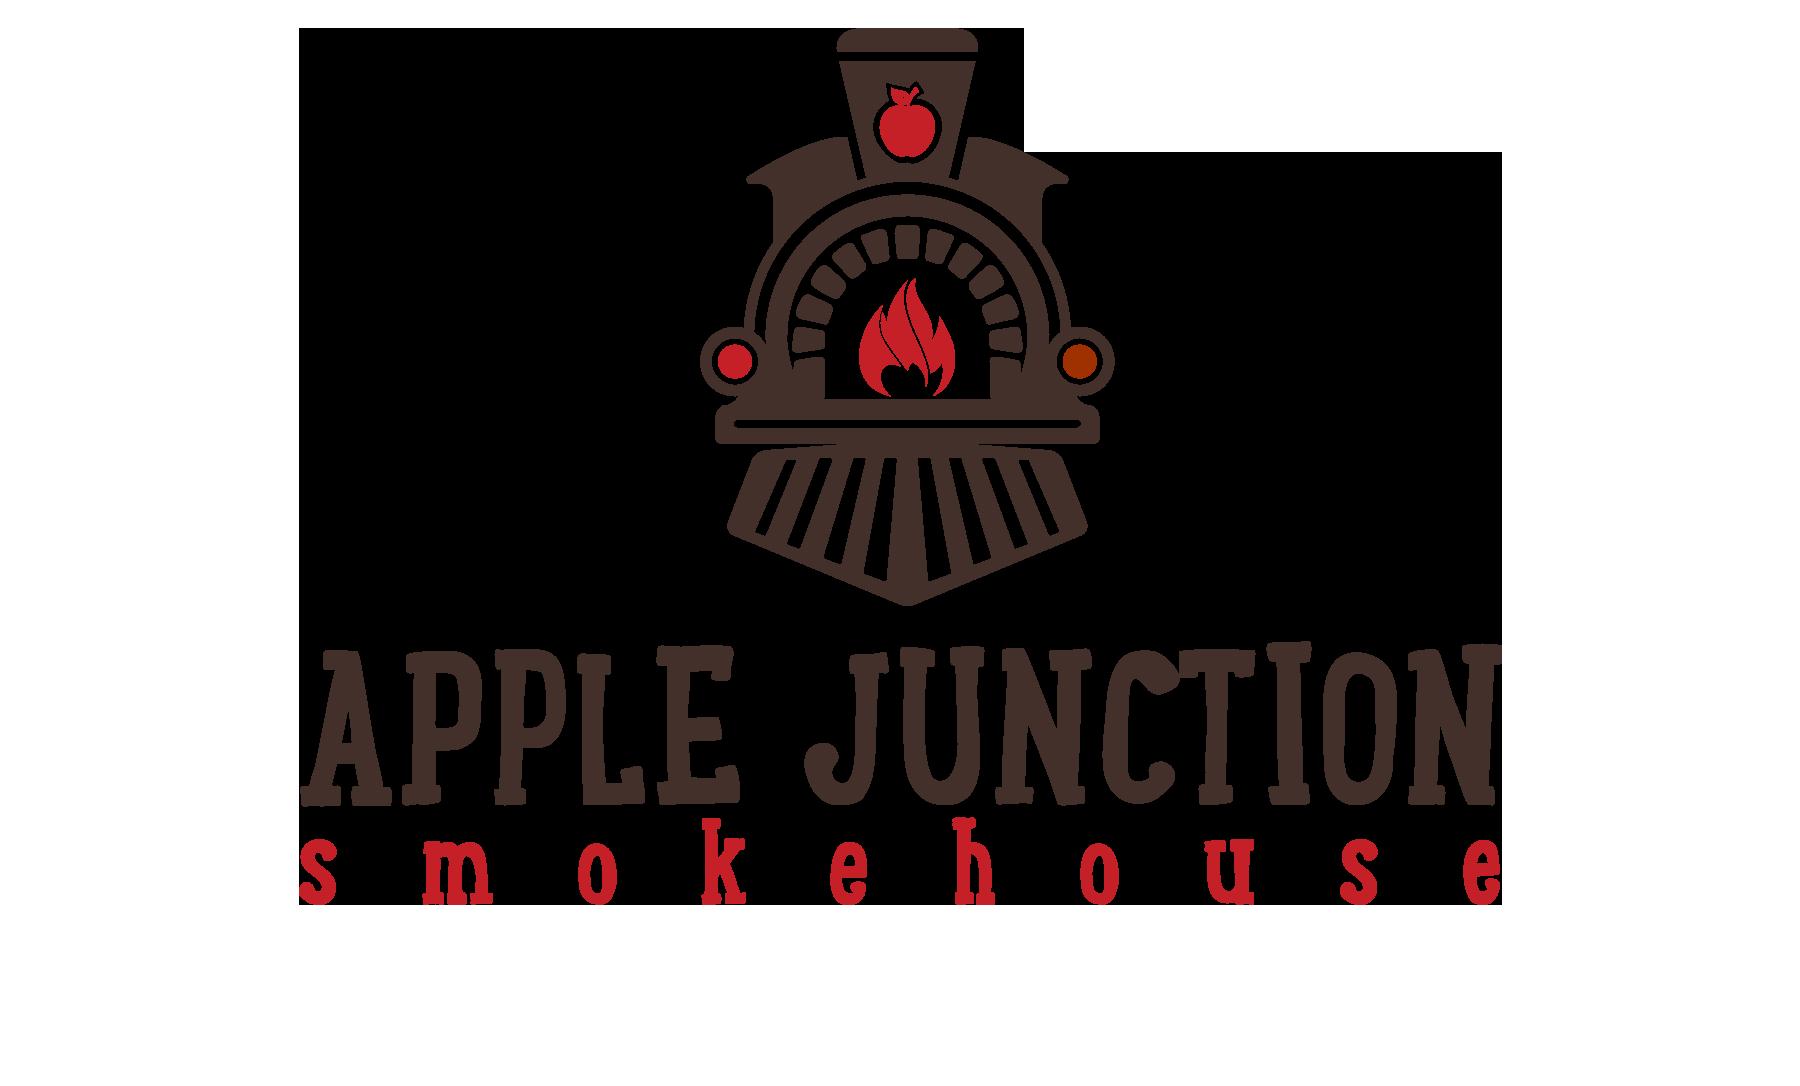 Apple Junction Smokehouse